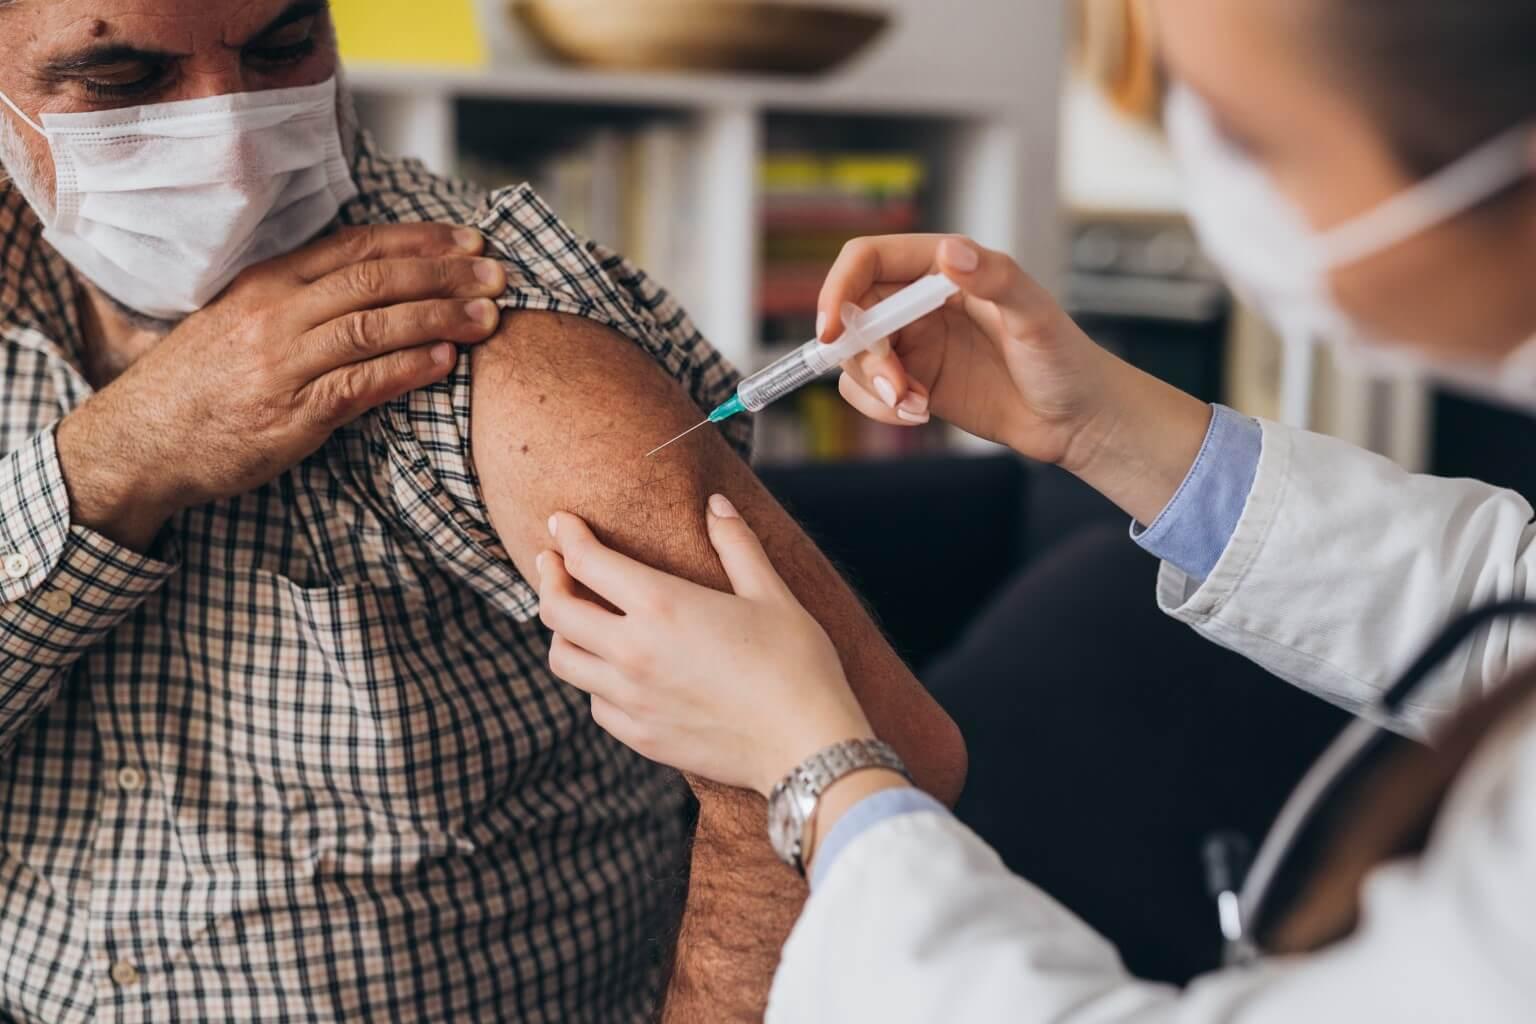 COVID-19 vaccine inhection